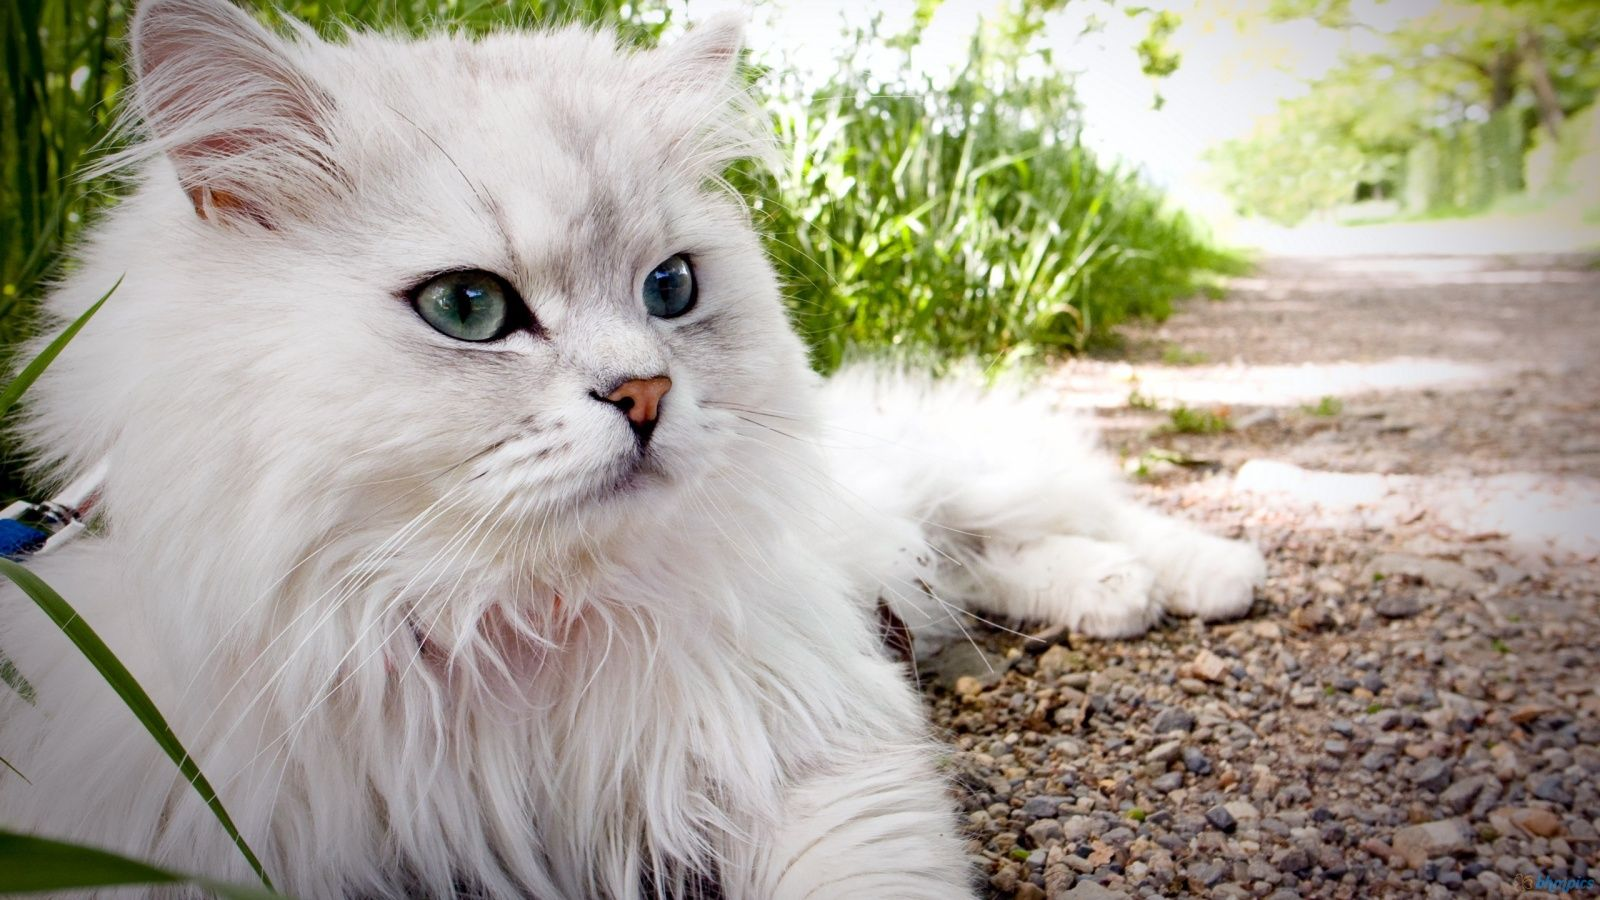 809a31790730 Striking Grey Persian Cats Hd Fluffy Cat Desktop Backgrounds Wallpaper Free  Popular Grey Persian Cat Wallpaper